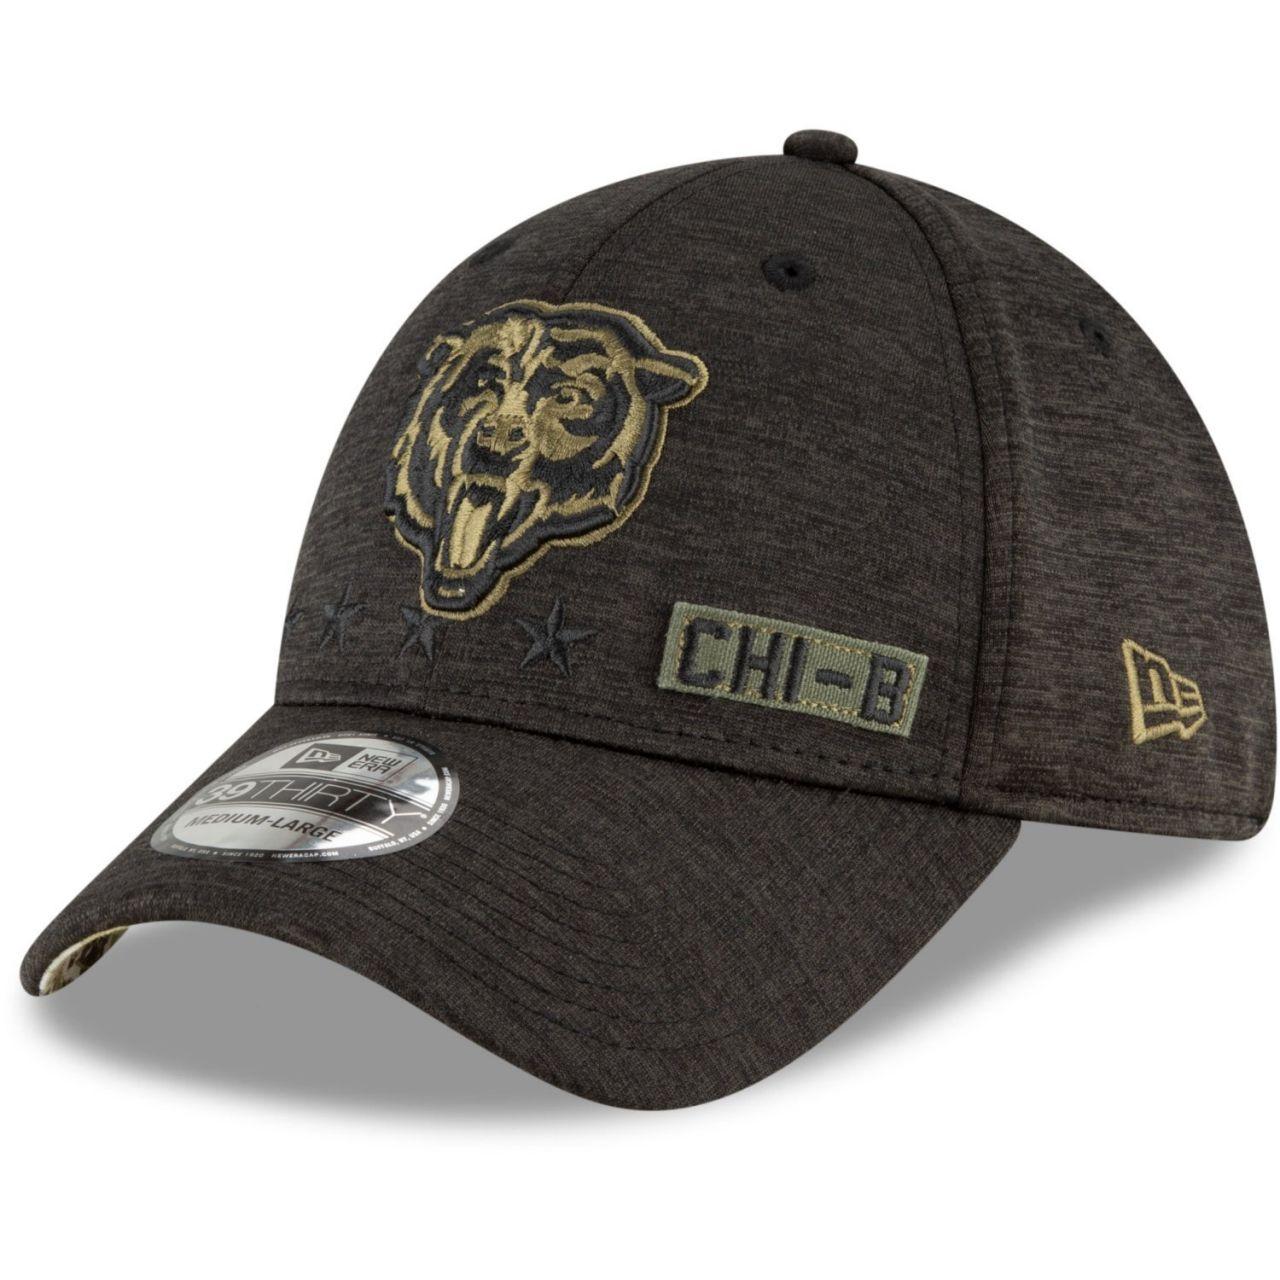 amfoo - New Era 39Thirty Cap Salute to Service Chicago Bears